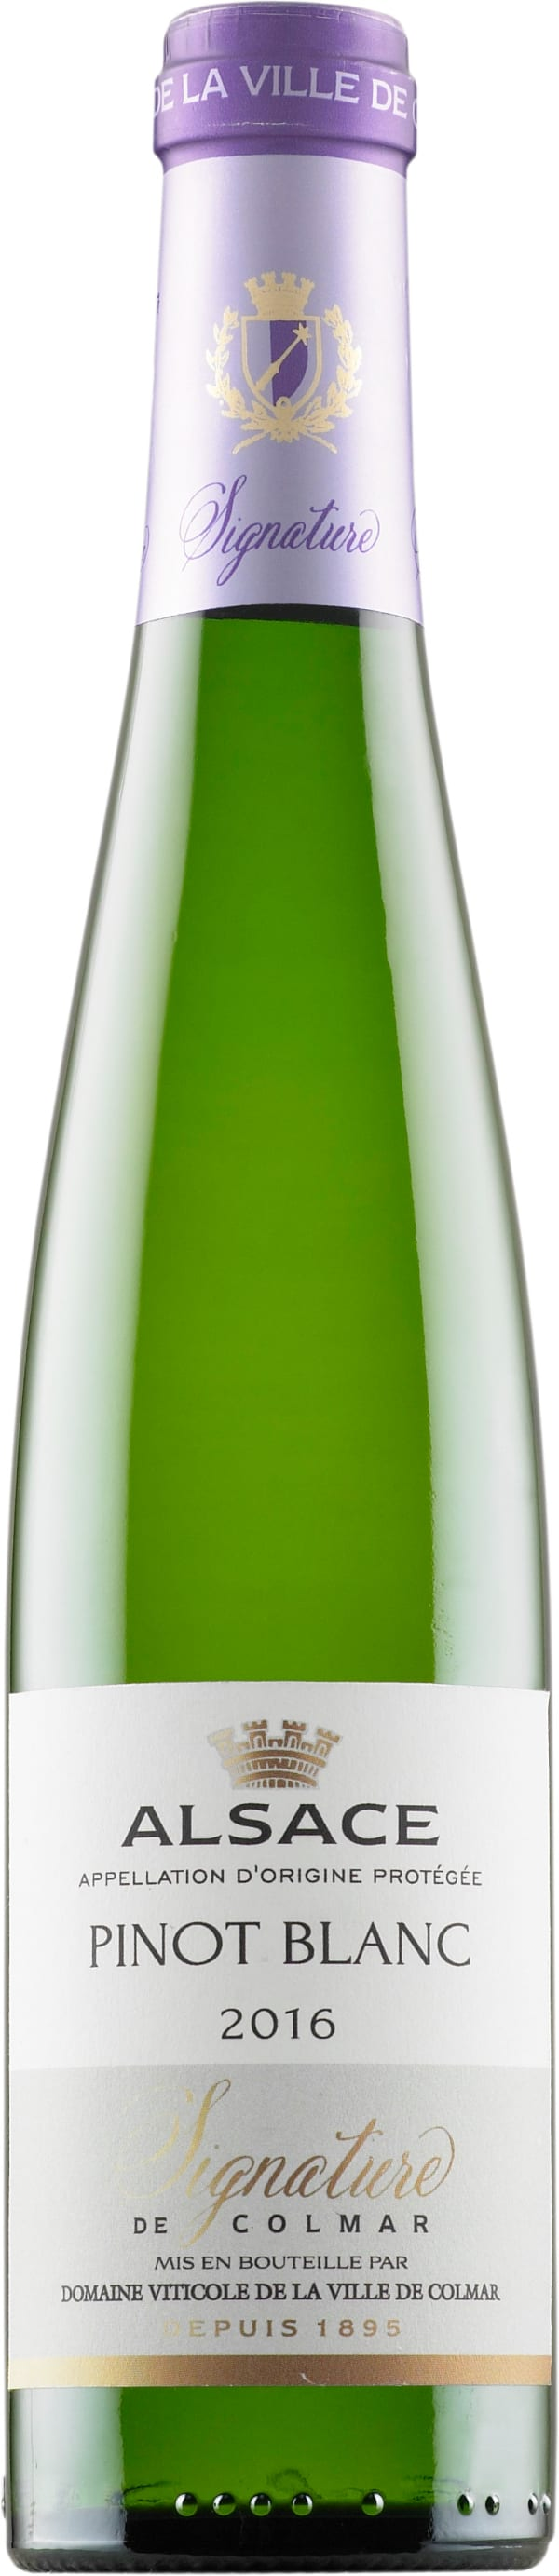 Signature de Colmar Pinot Blanc 2016